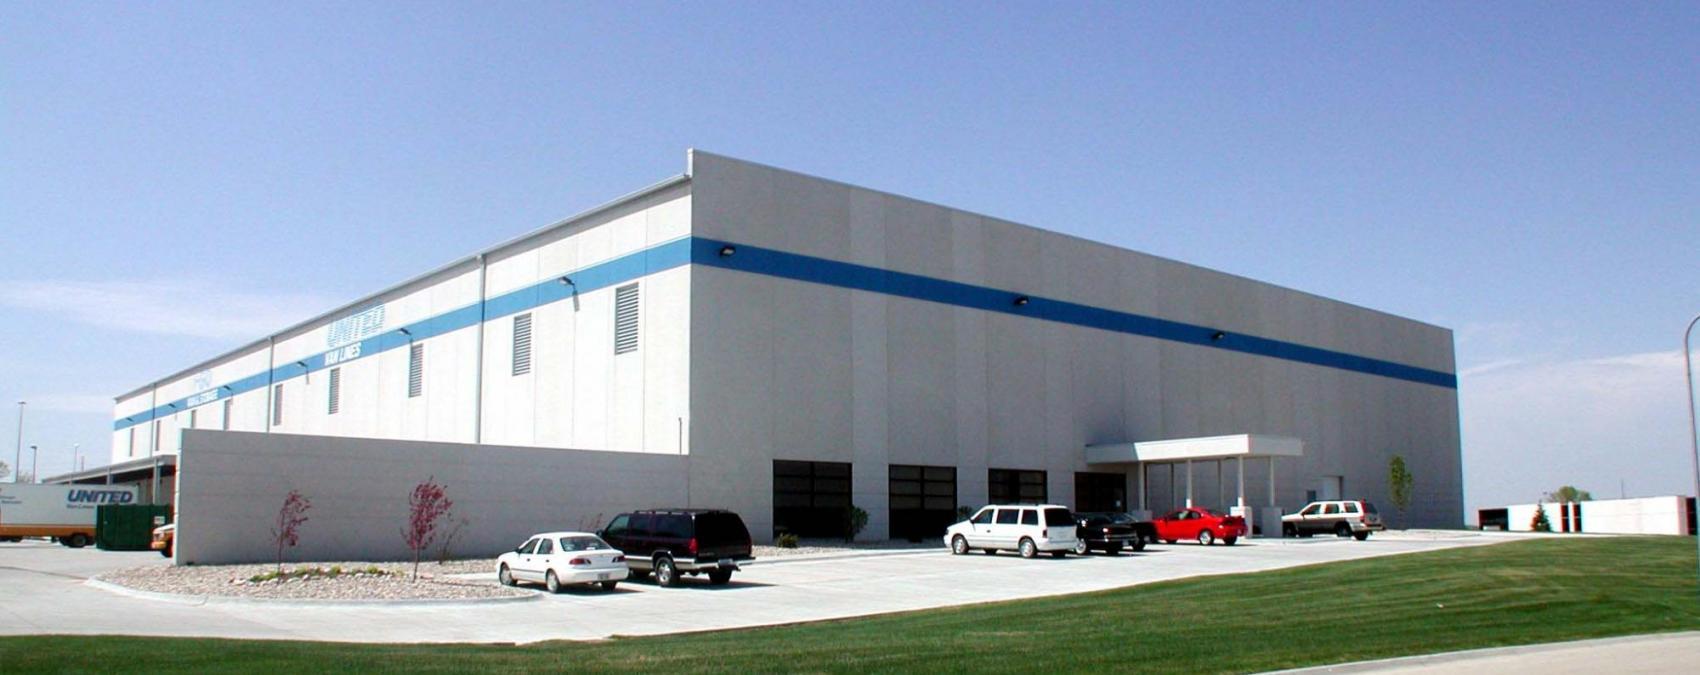 I Go Van Amp Storage Darland Construction Building To A